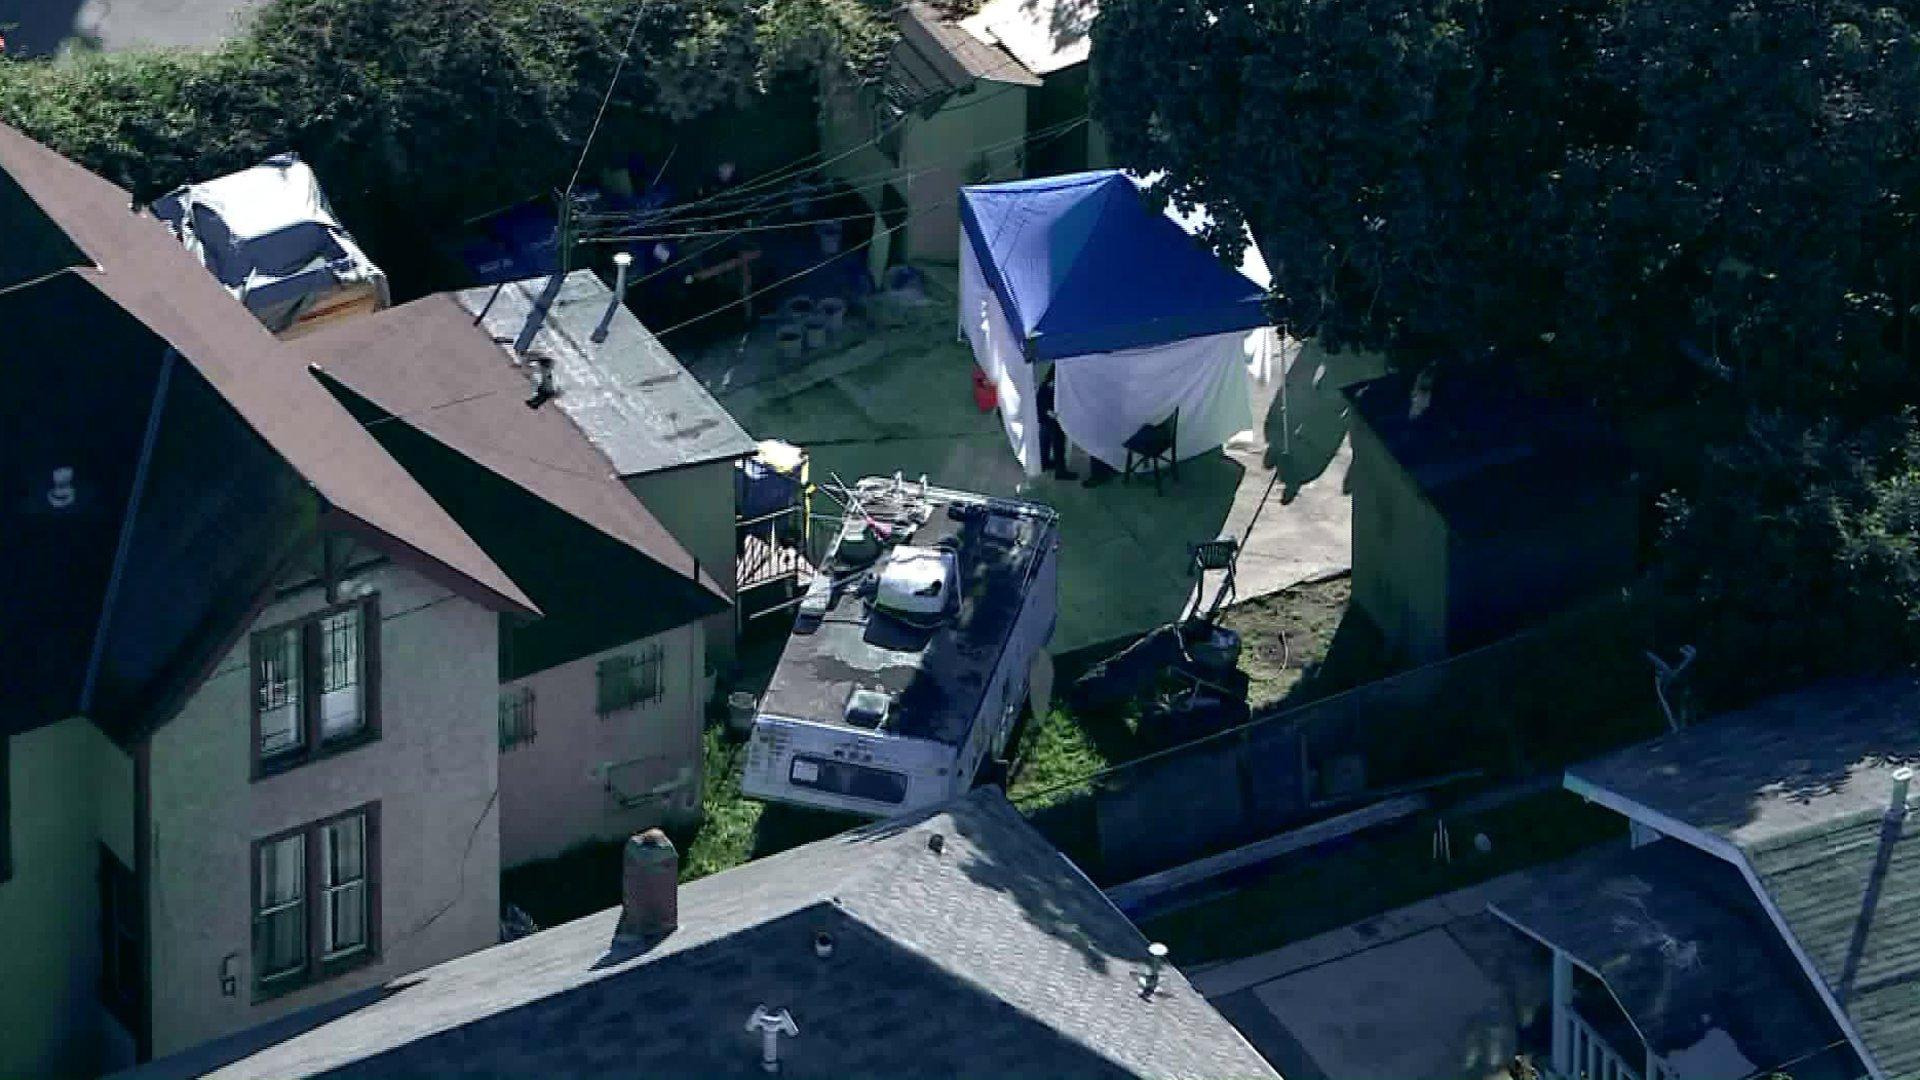 LAPD personnel were investigating a death in South Park on Jan. 23, 2020. (Credit: KTLA)